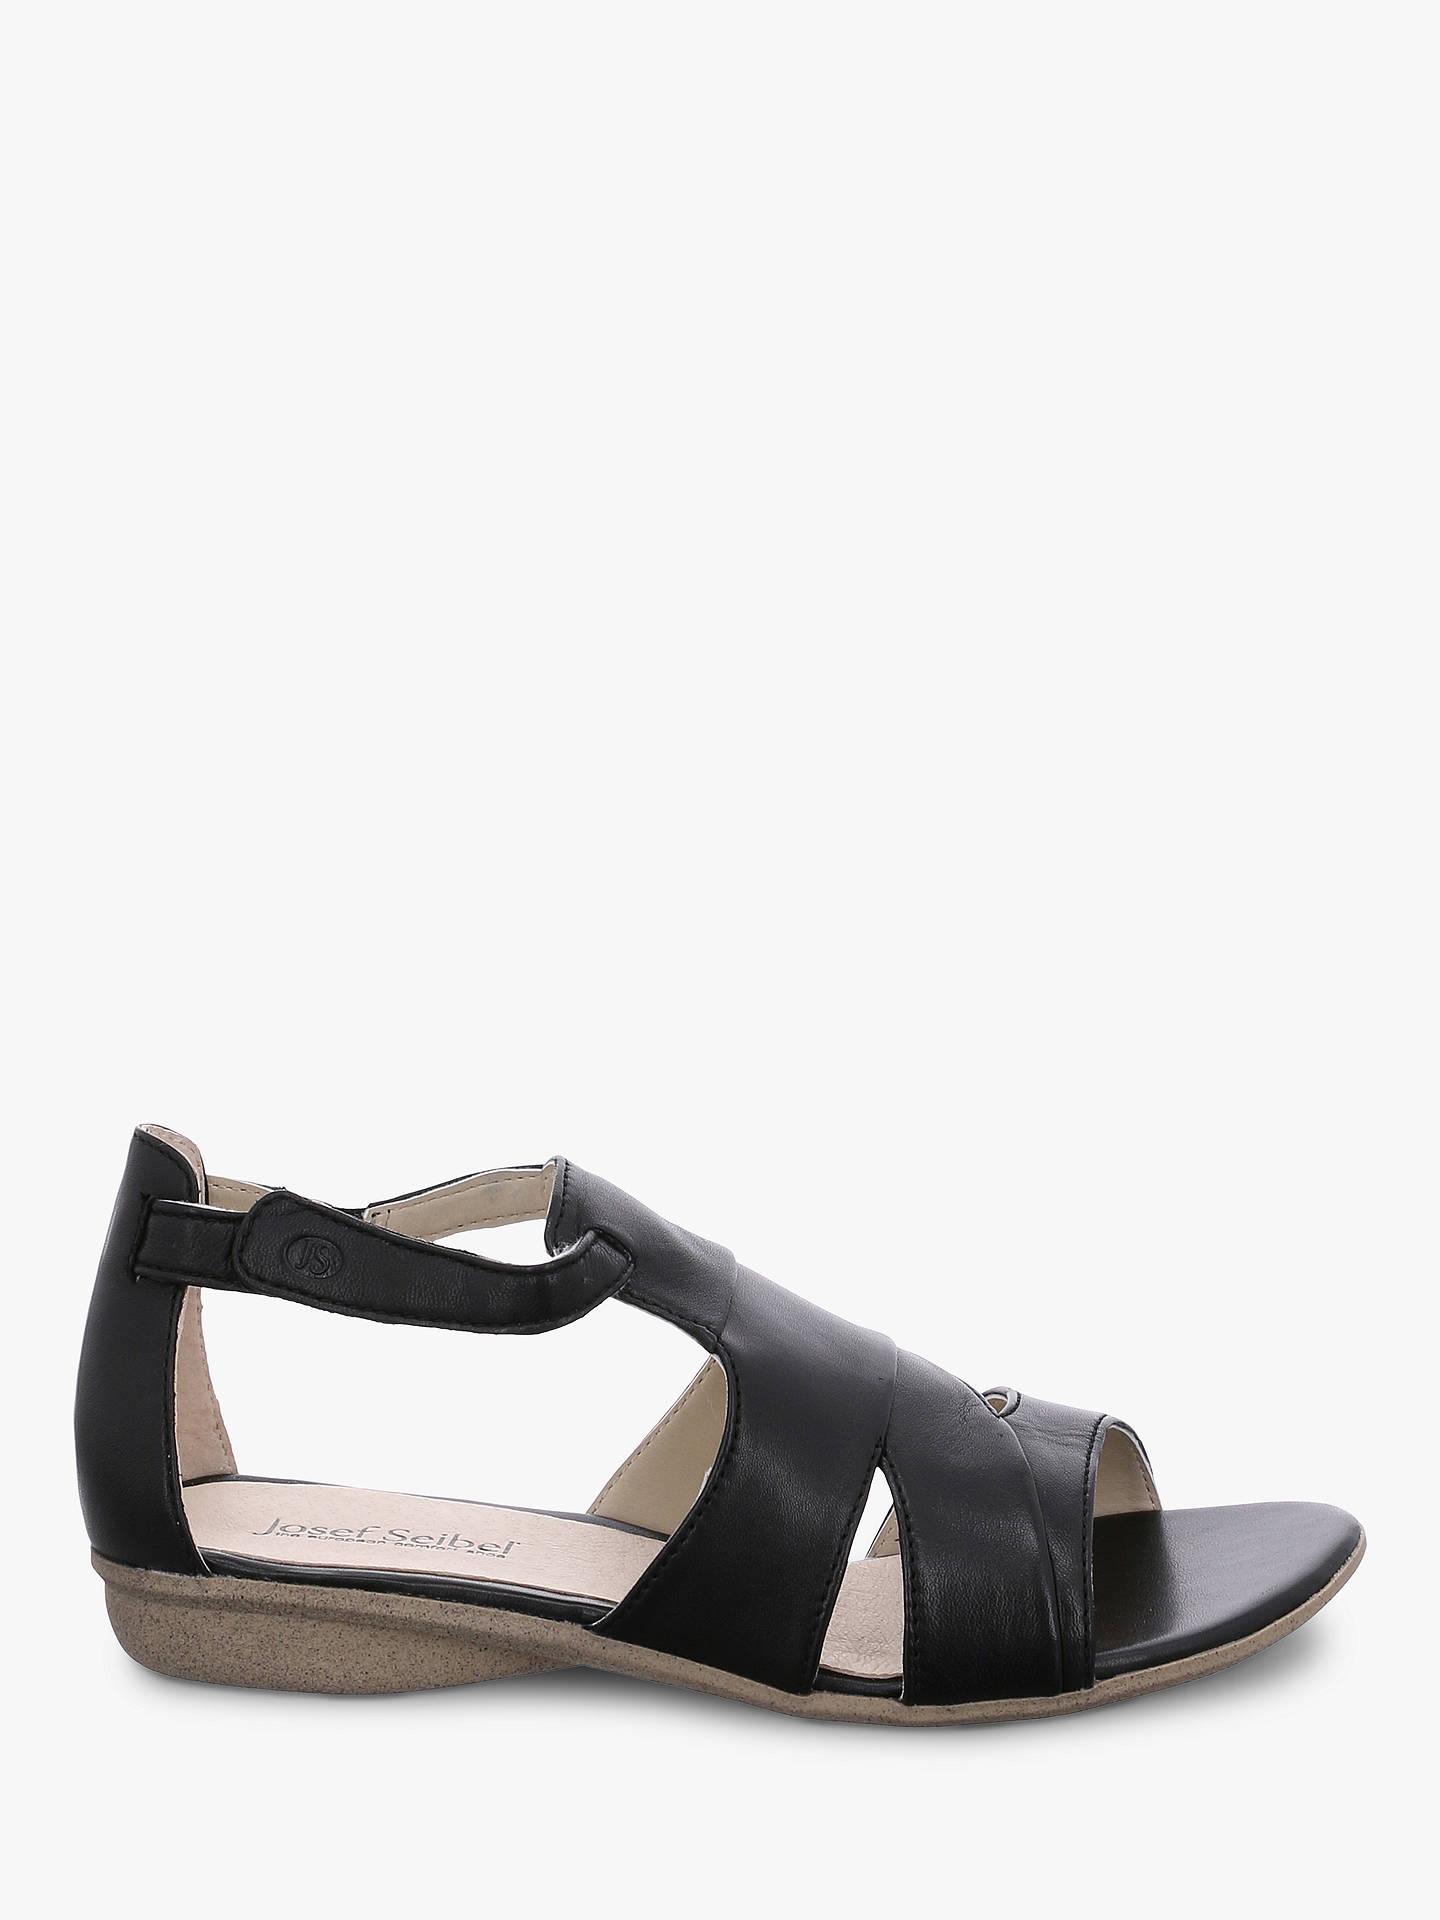 9e62a99b632 Buy Josef Seibel Fabia 03 Sandals